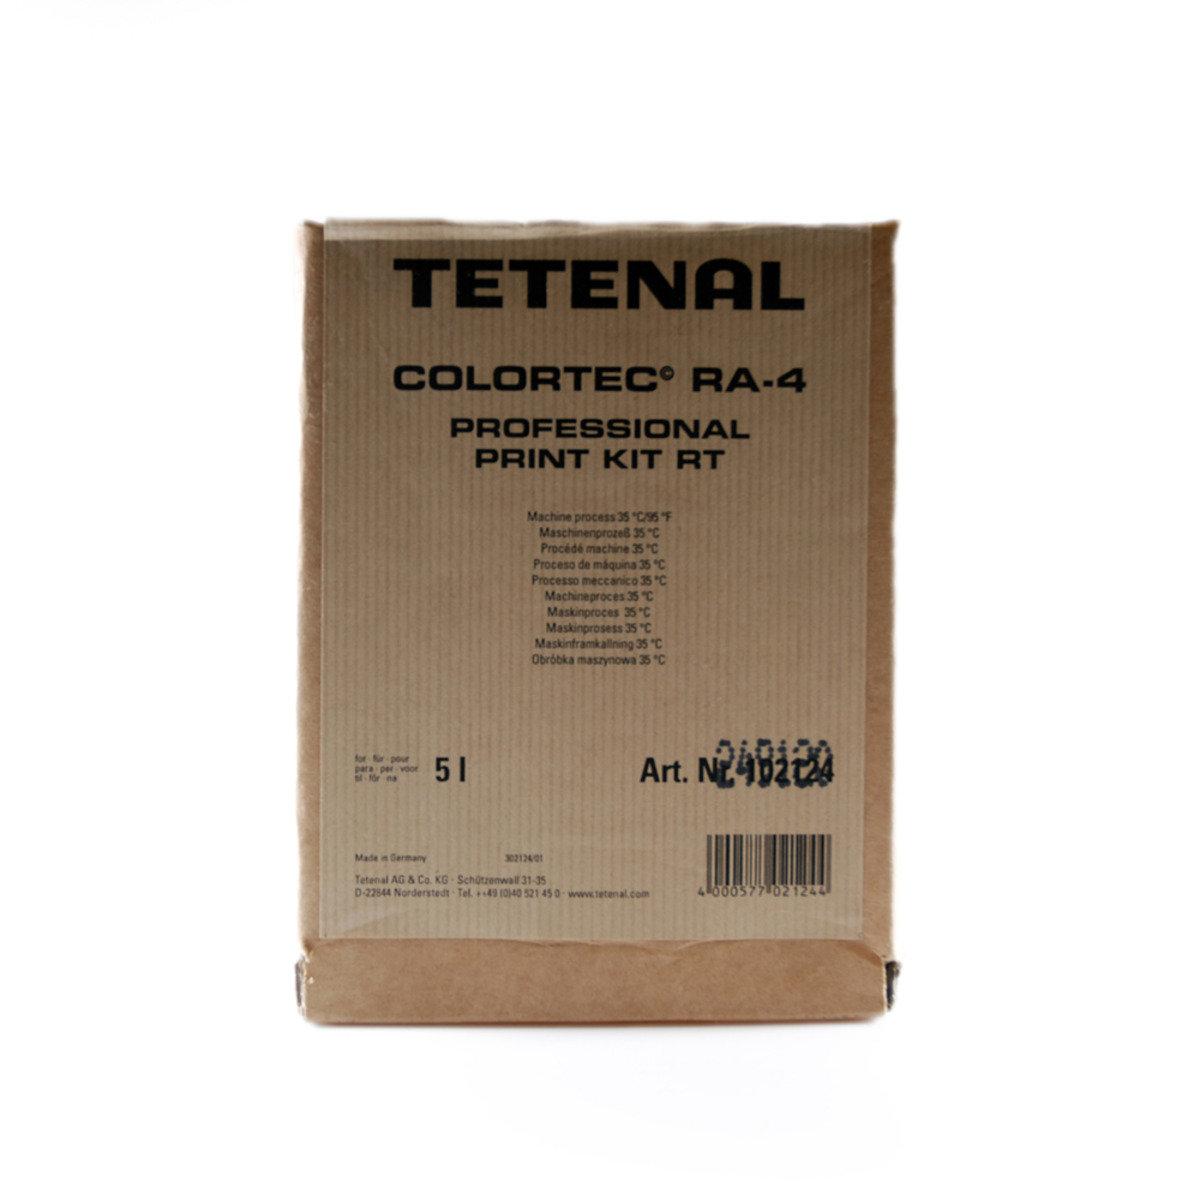 Colortec RA-4 彩色相紙沖洗套裝 (for 5L)